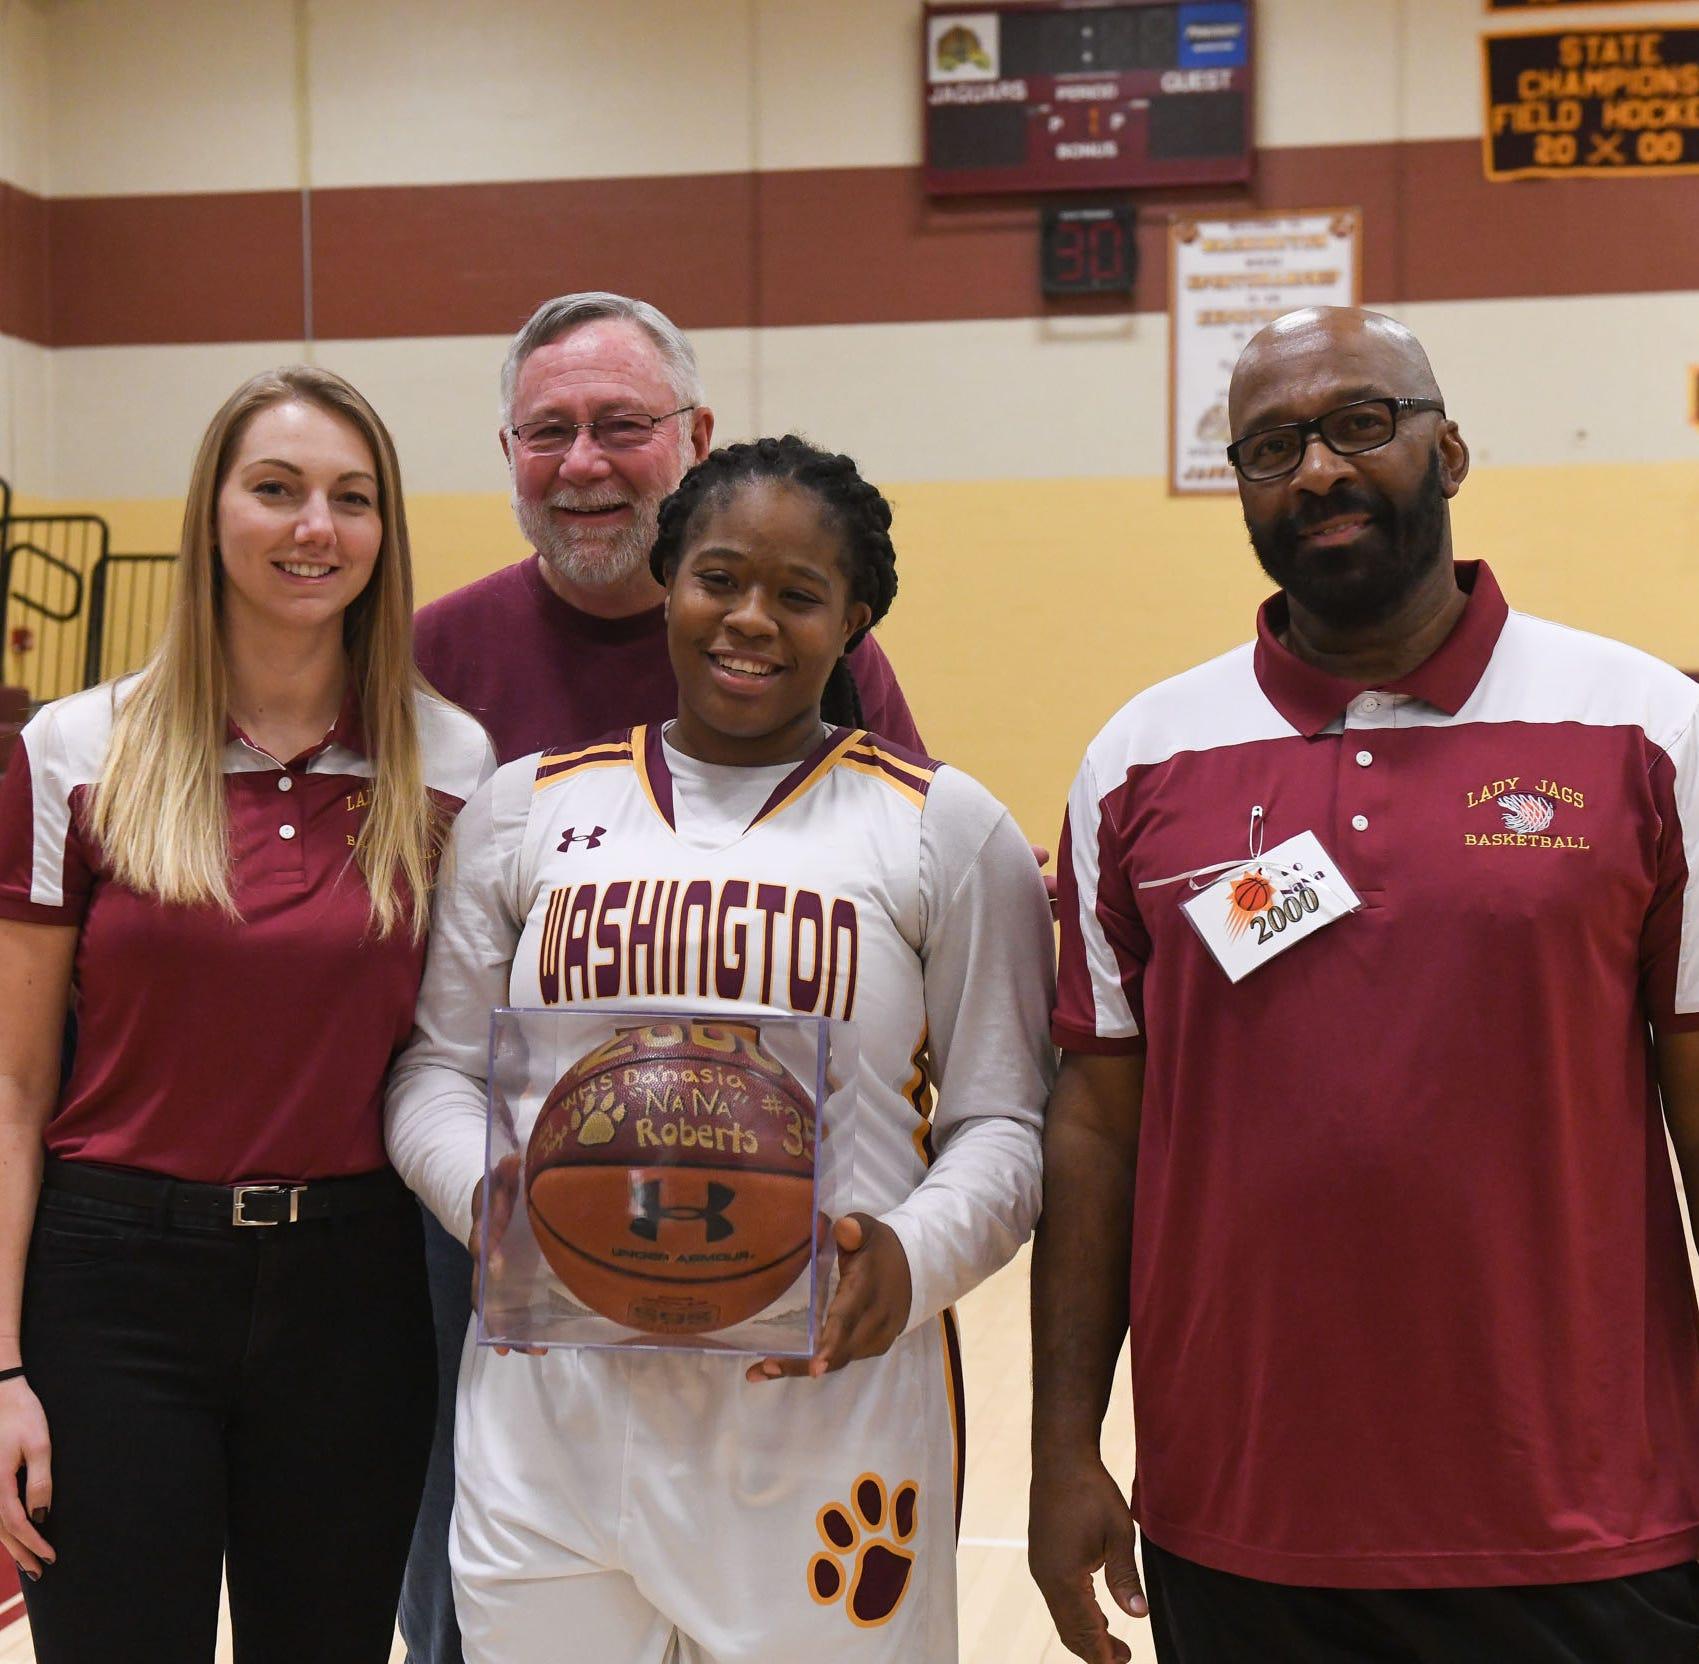 Washington girls basketball player scores 2,000 career points